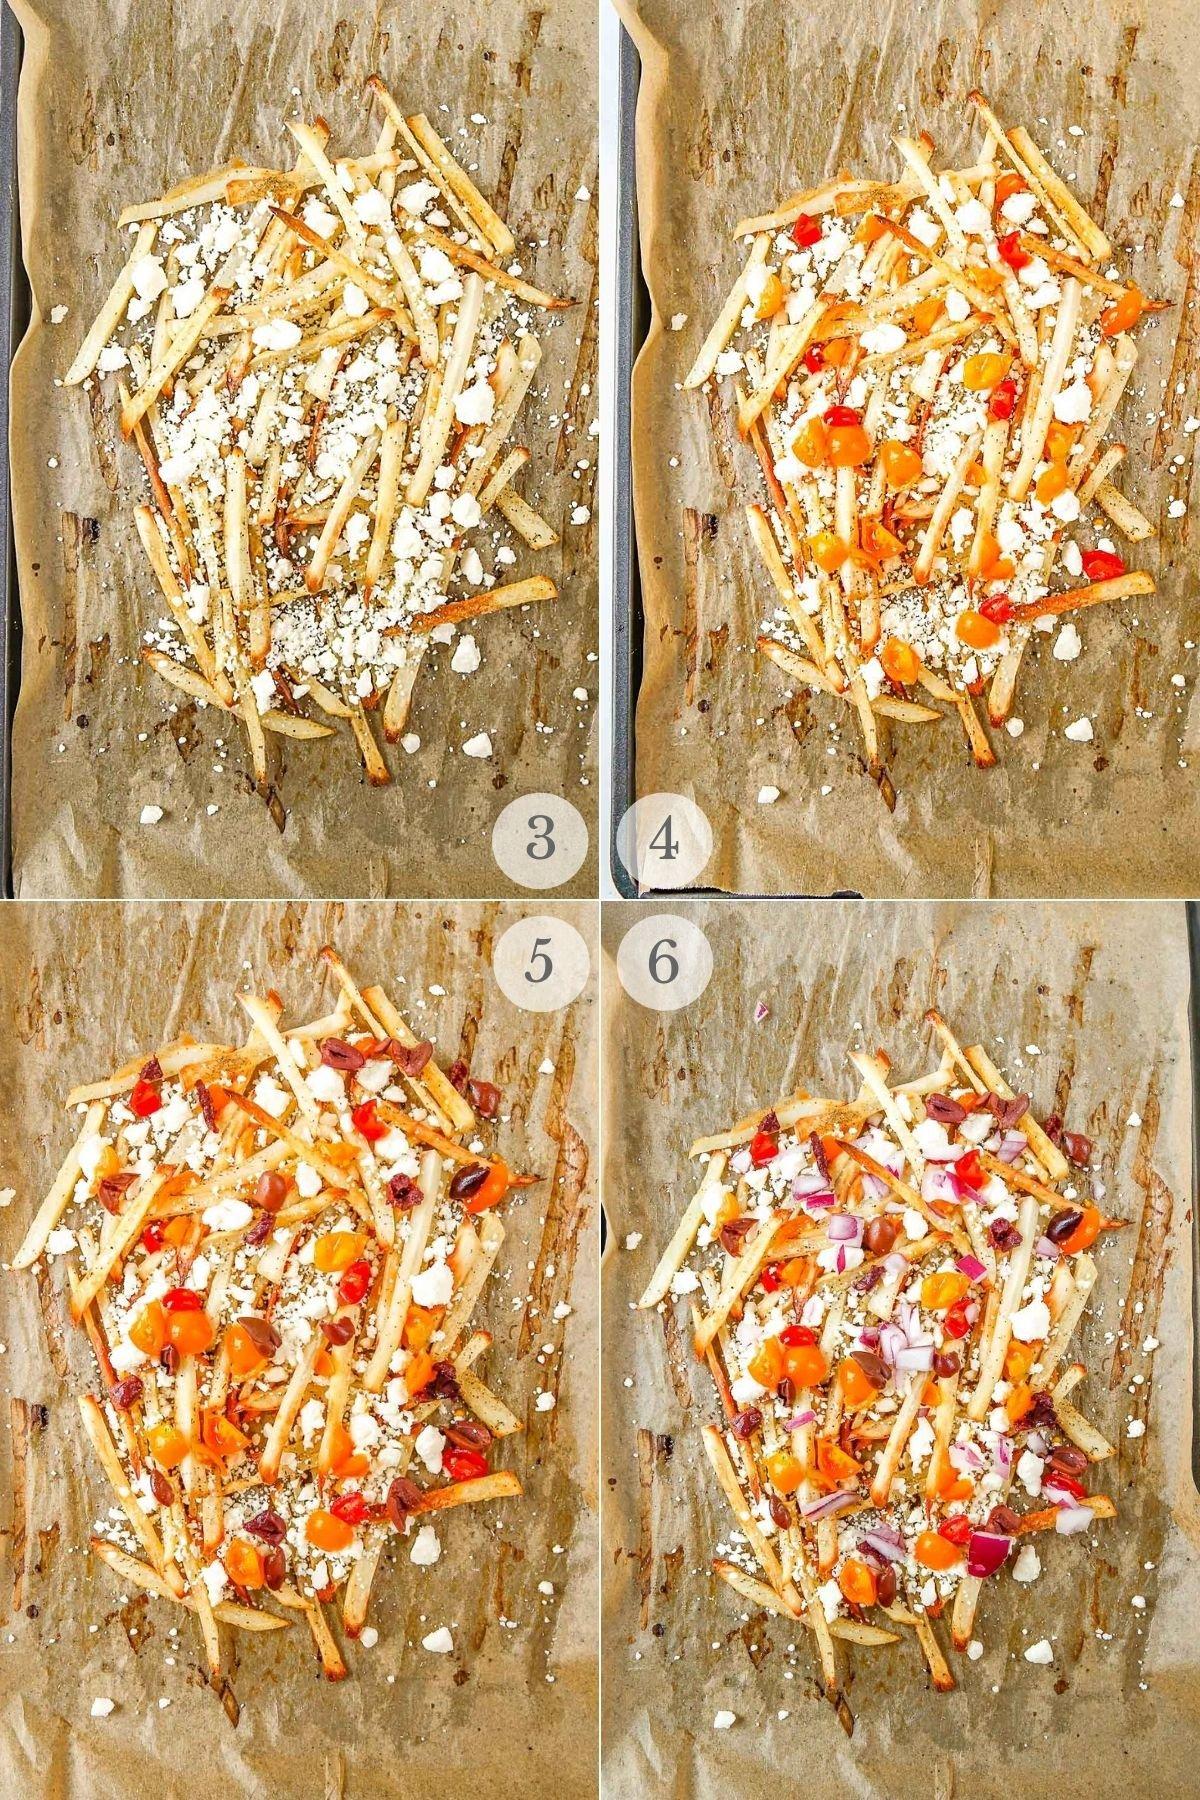 greek fries recipe steps 3-6